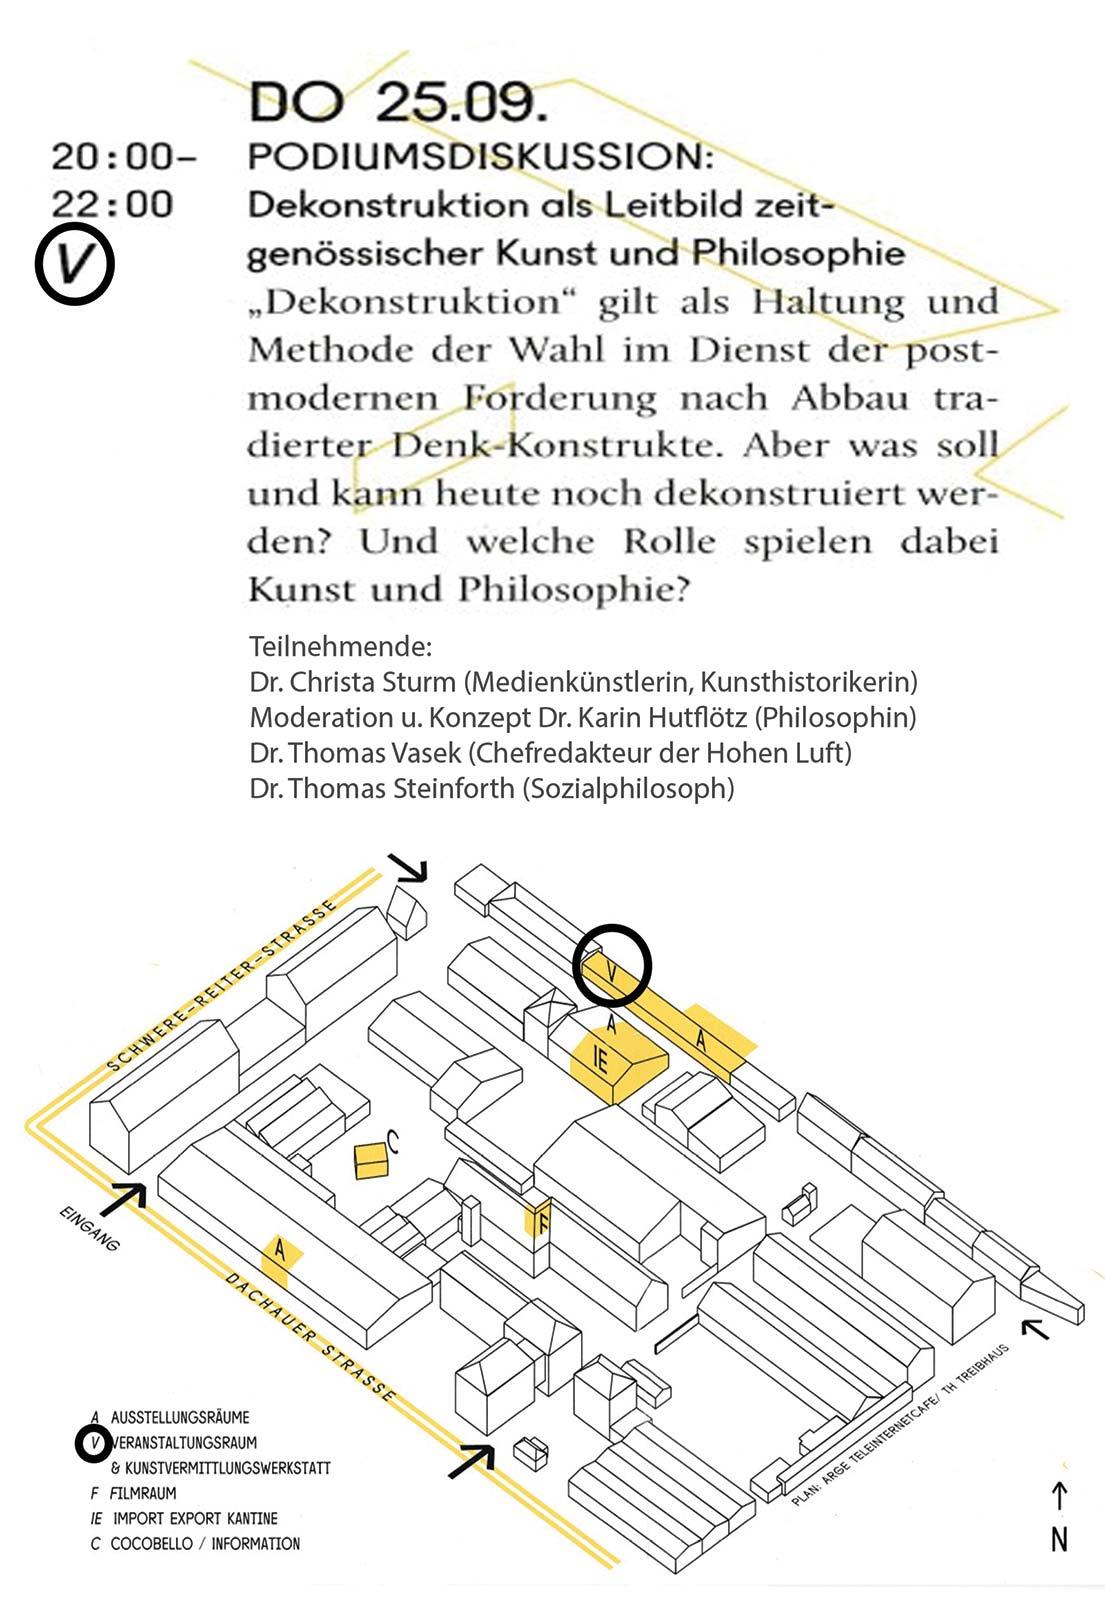 under-deconstruction-podiumsdiskussion-21200web